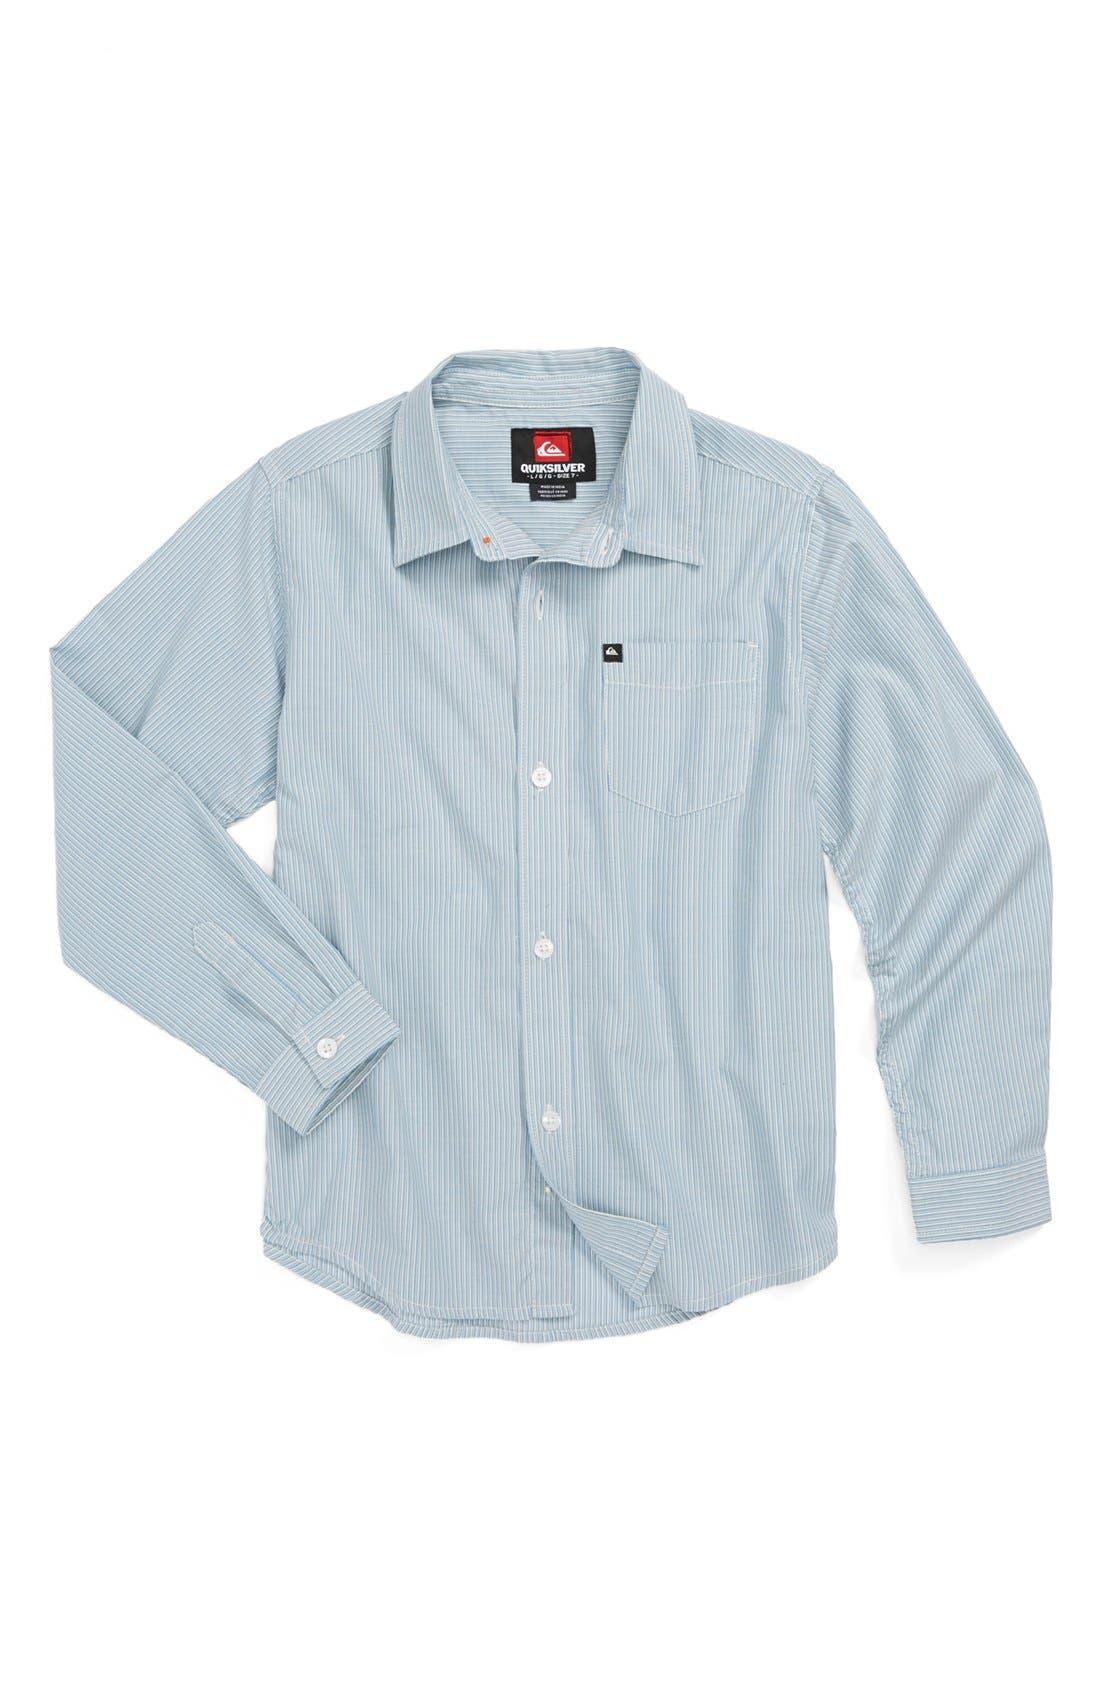 Alternate Image 1 Selected - Quiksilver 'Midnight Dunk' Sport Shirt (Little Boys)